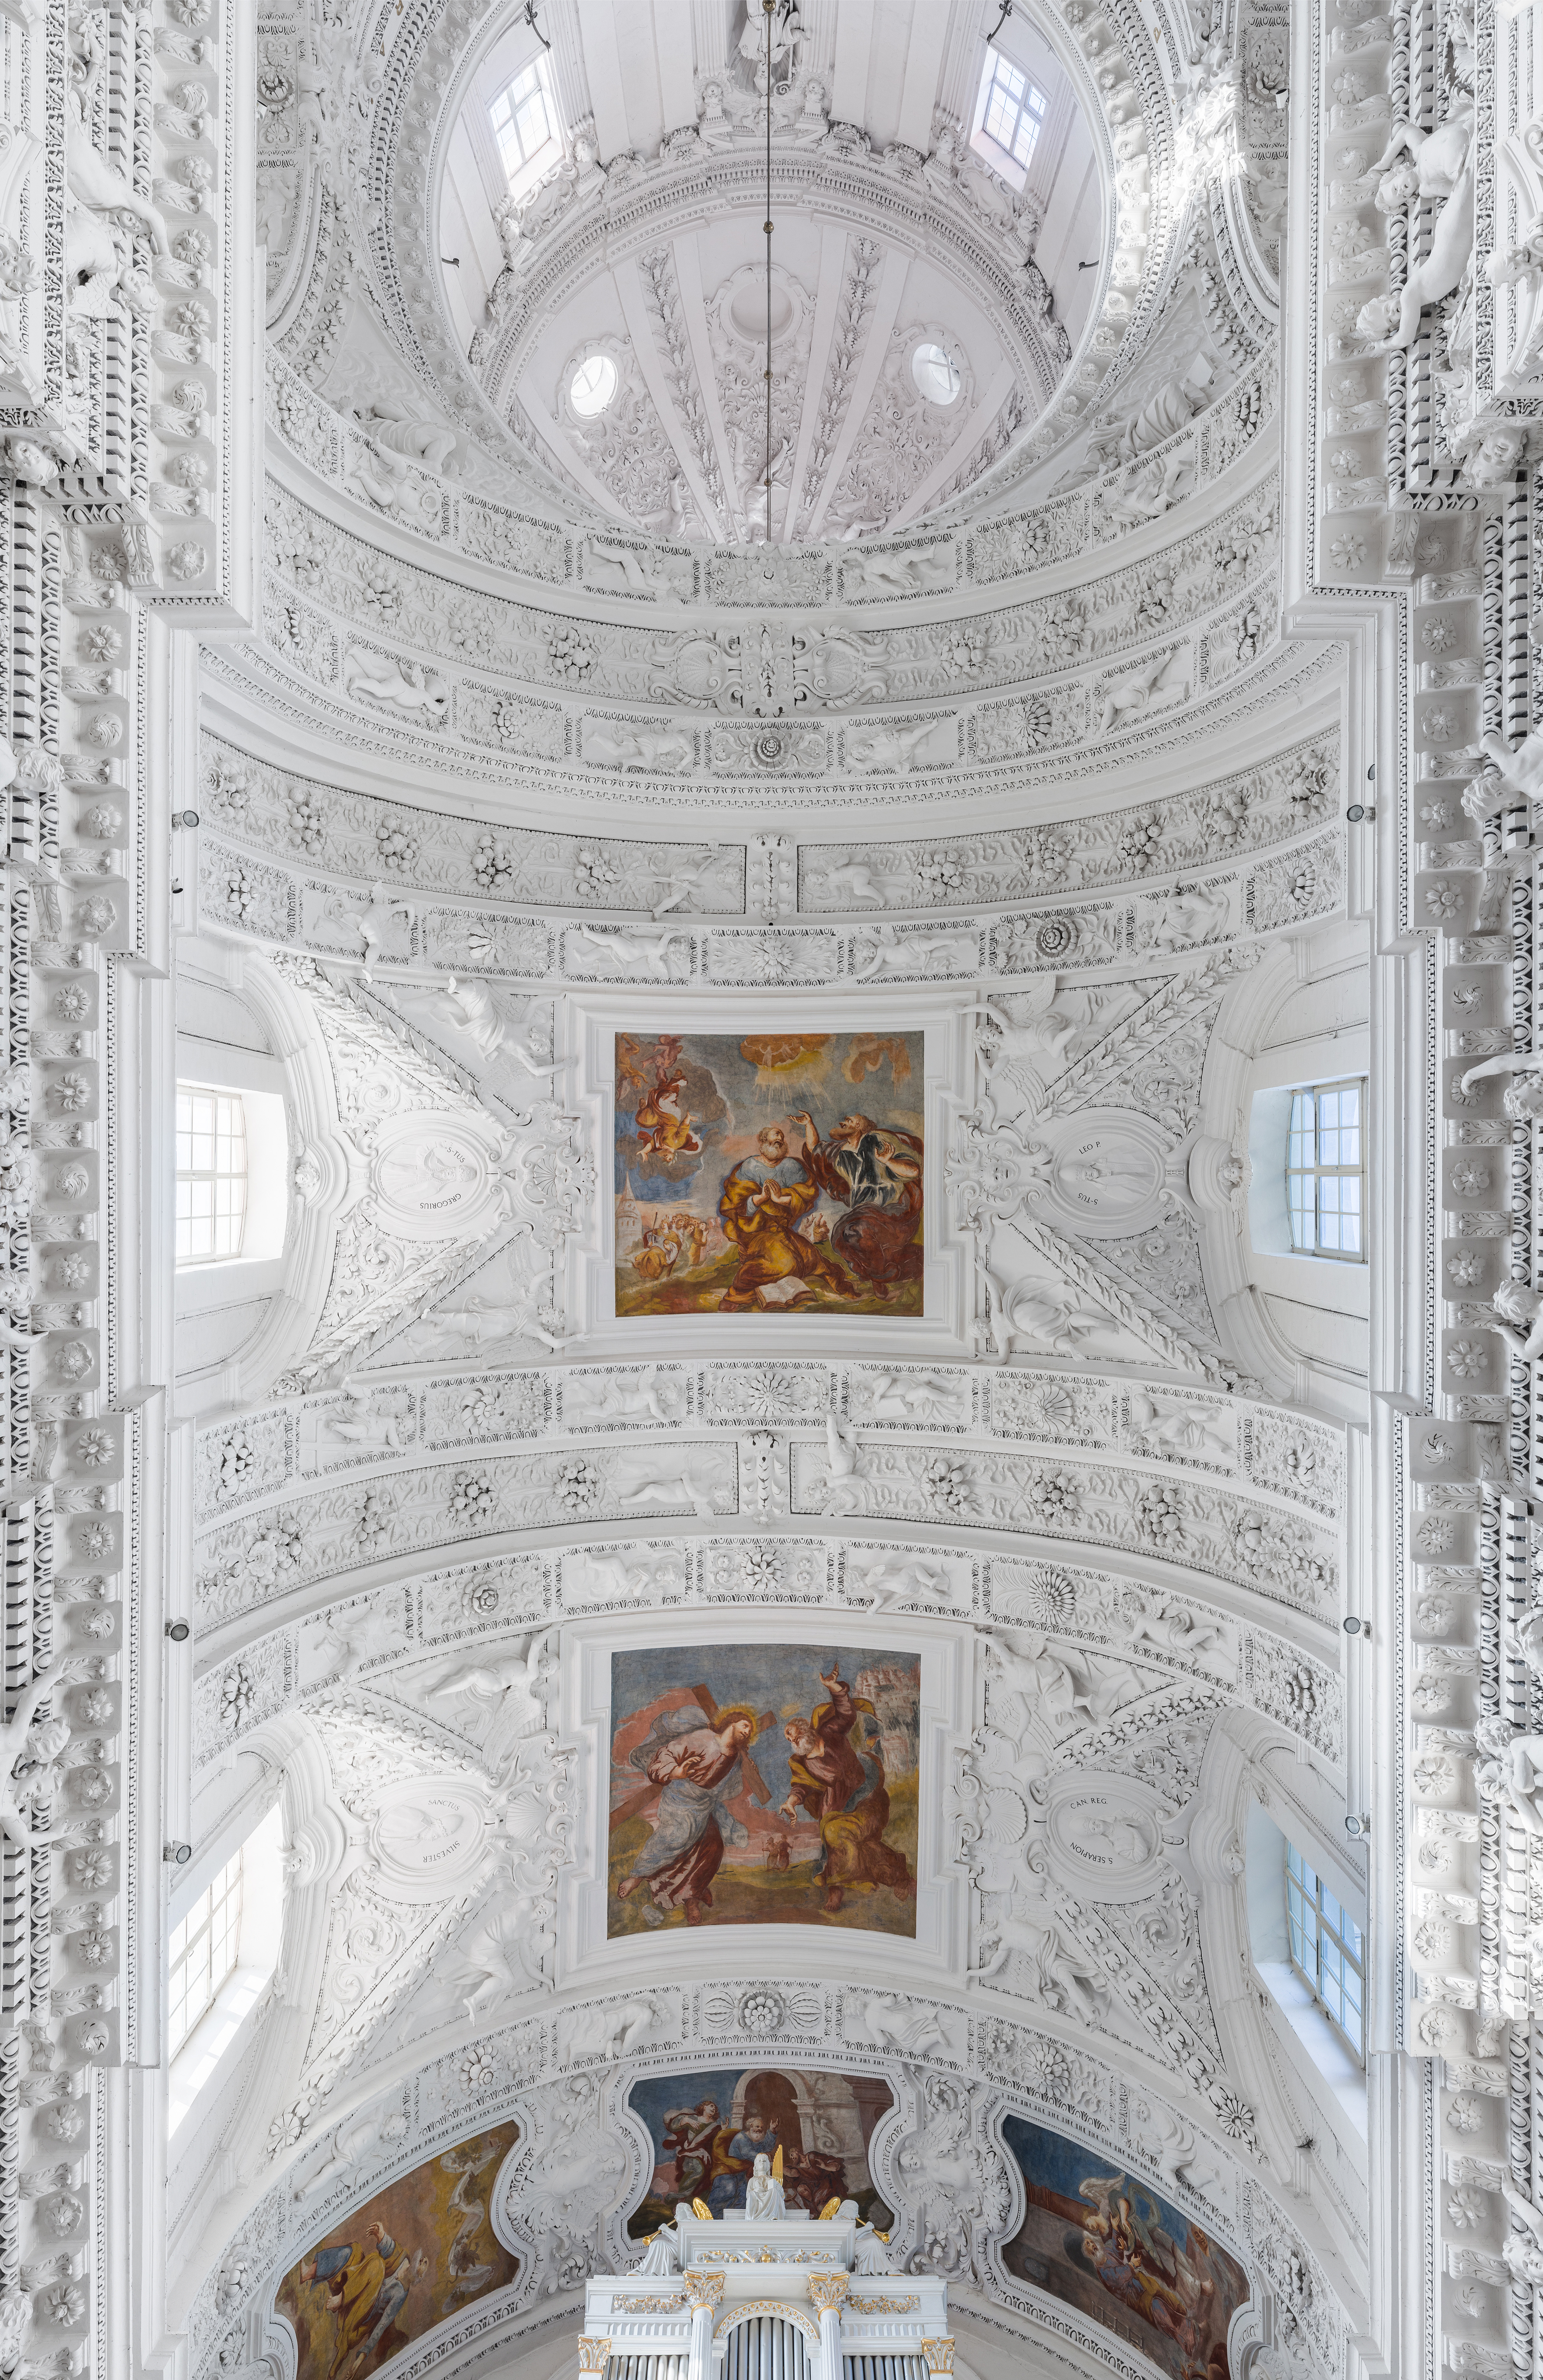 St._Peter_and_St._Paul%27s_Church_Ceiling%2C_Vilnius%2C_Lithuania_-_Diliff.jpg